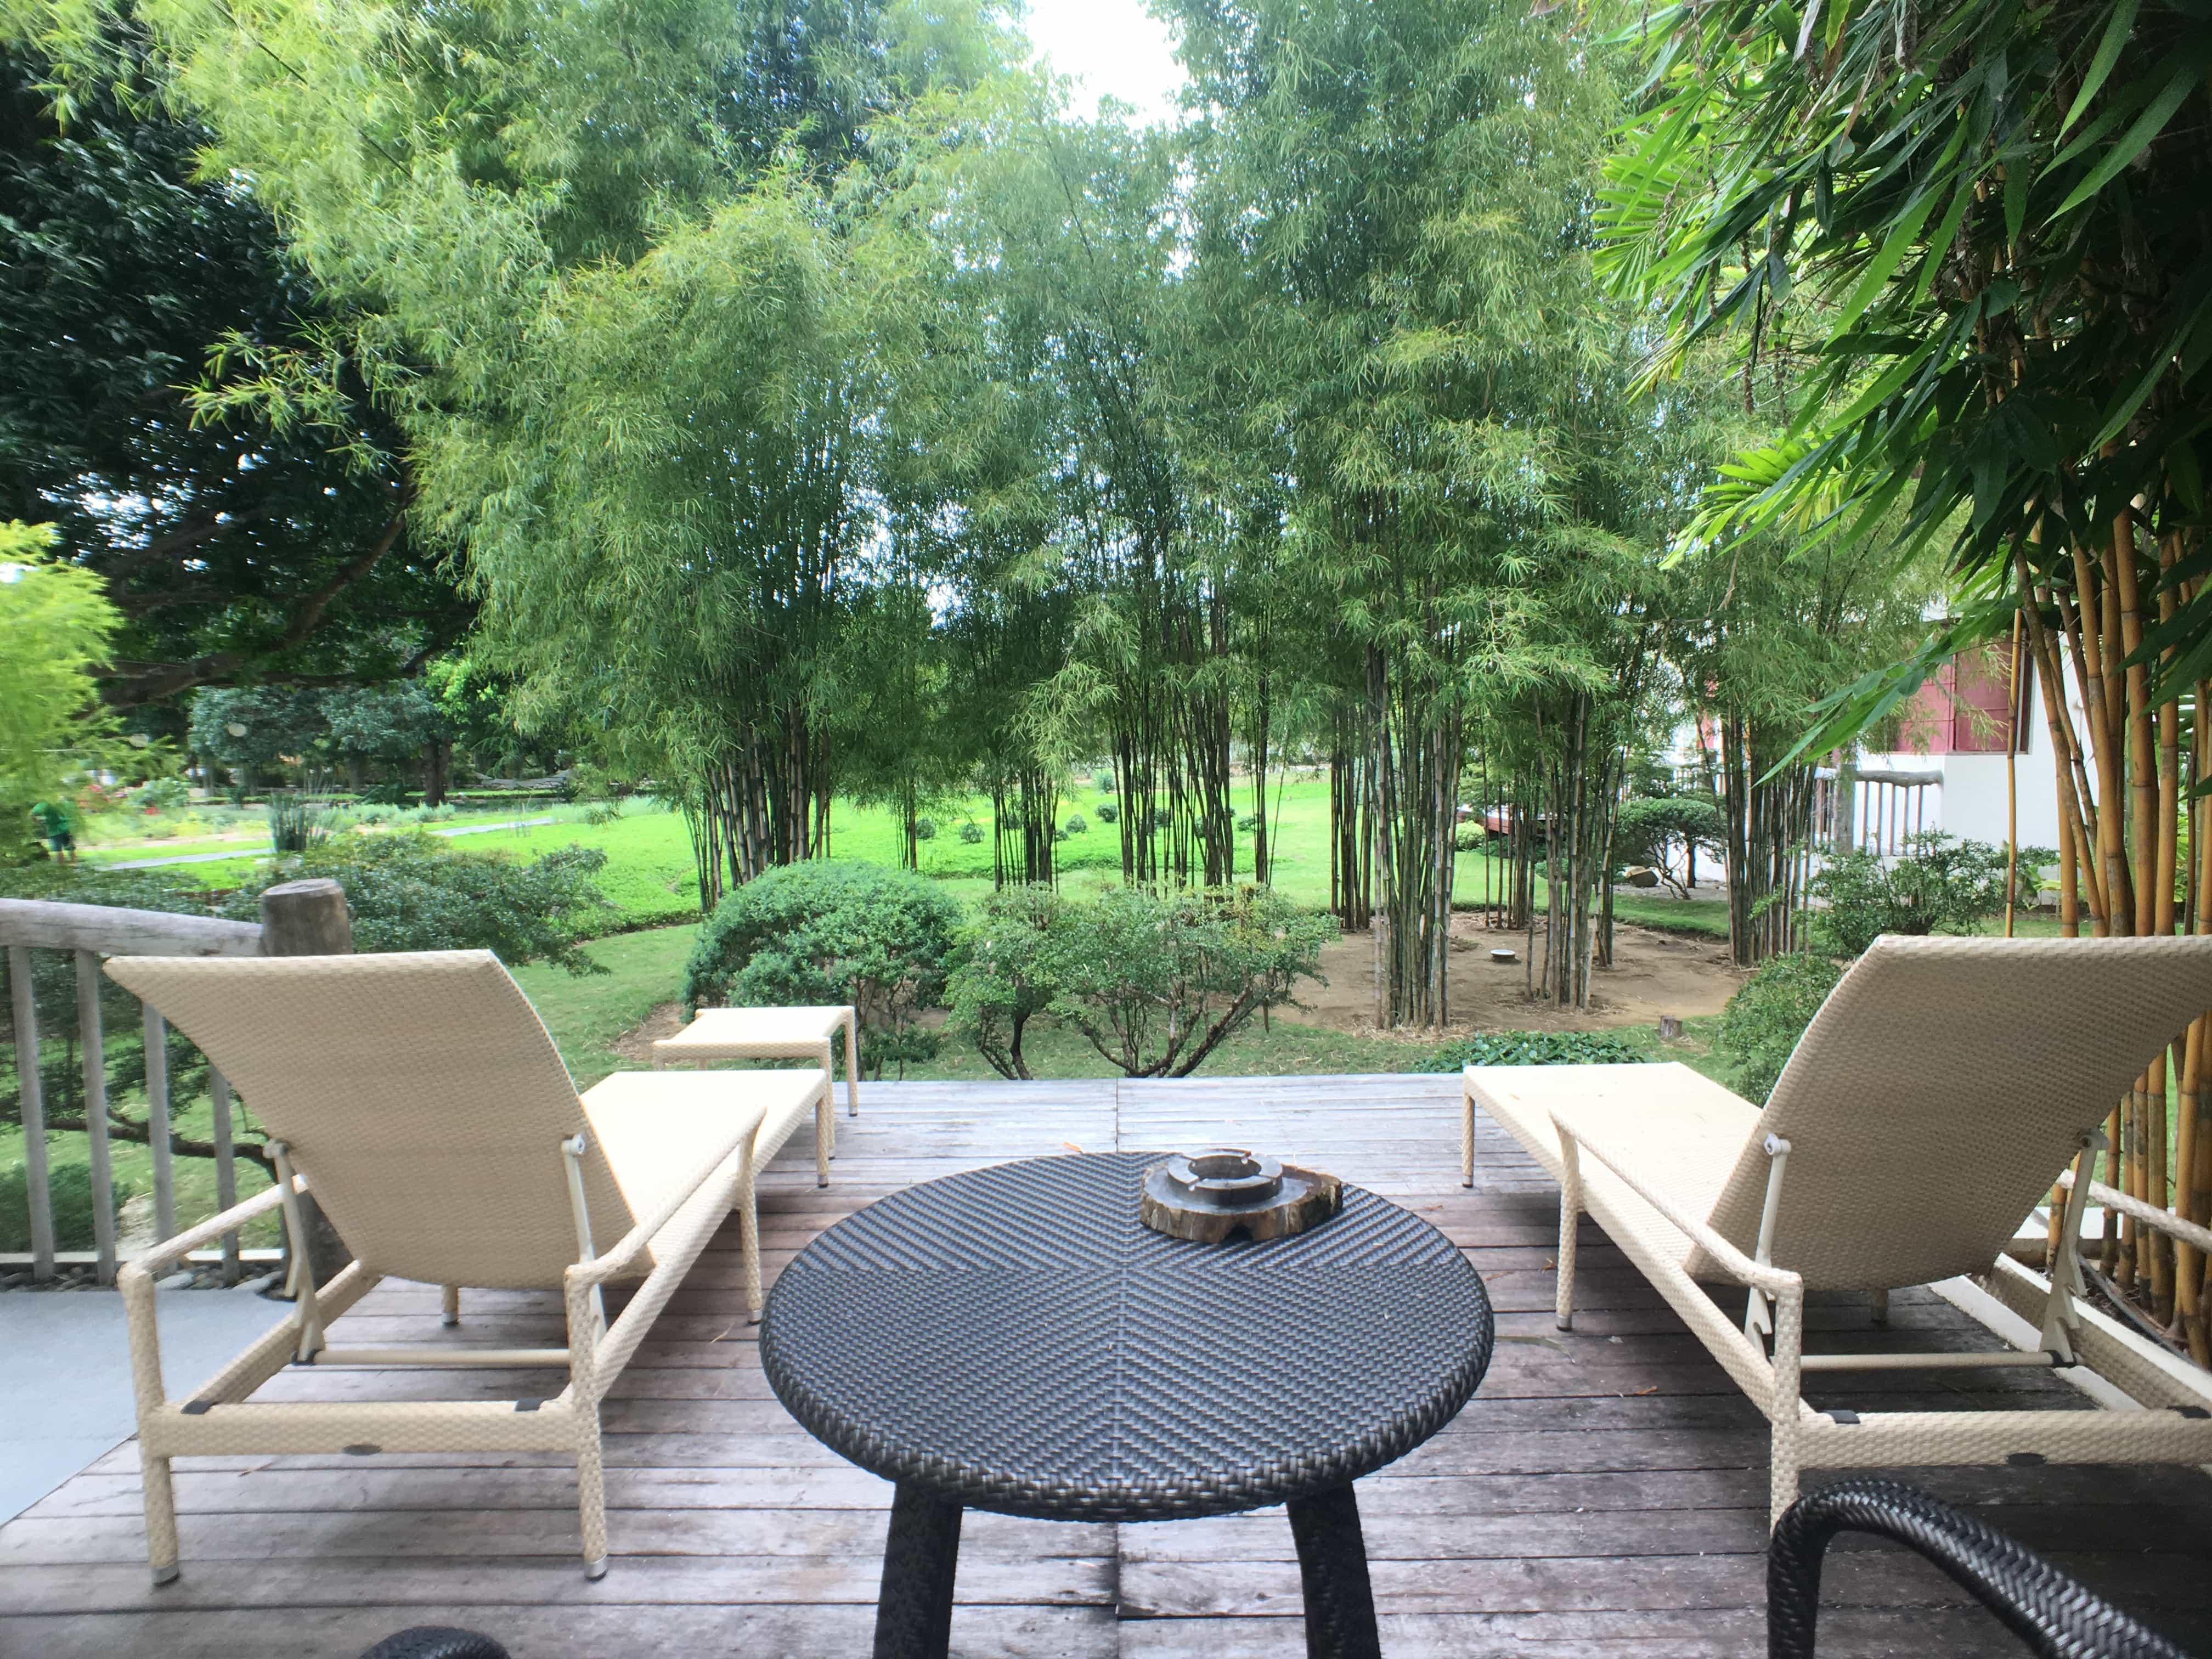 Villa in a romantic vacation in Bohol